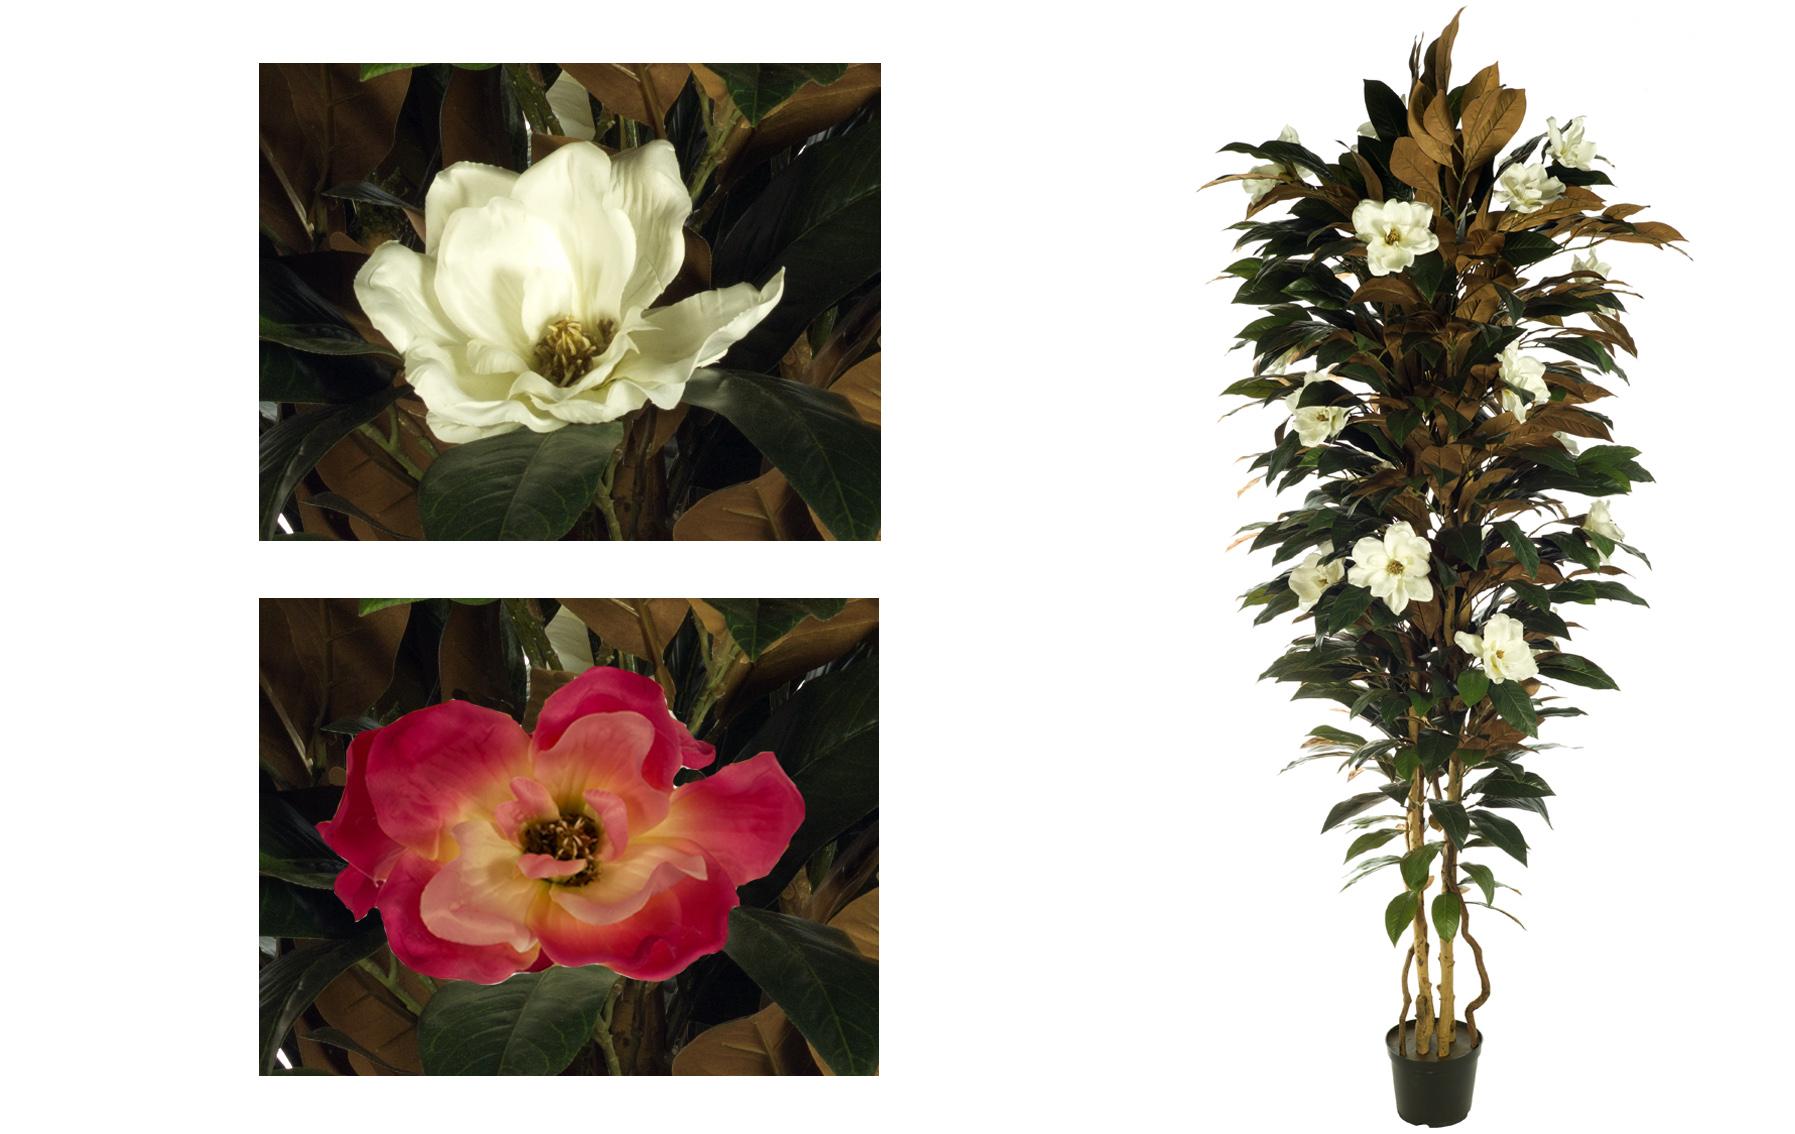 ARBOL MAGNOLIA www.florsymuchomas.com